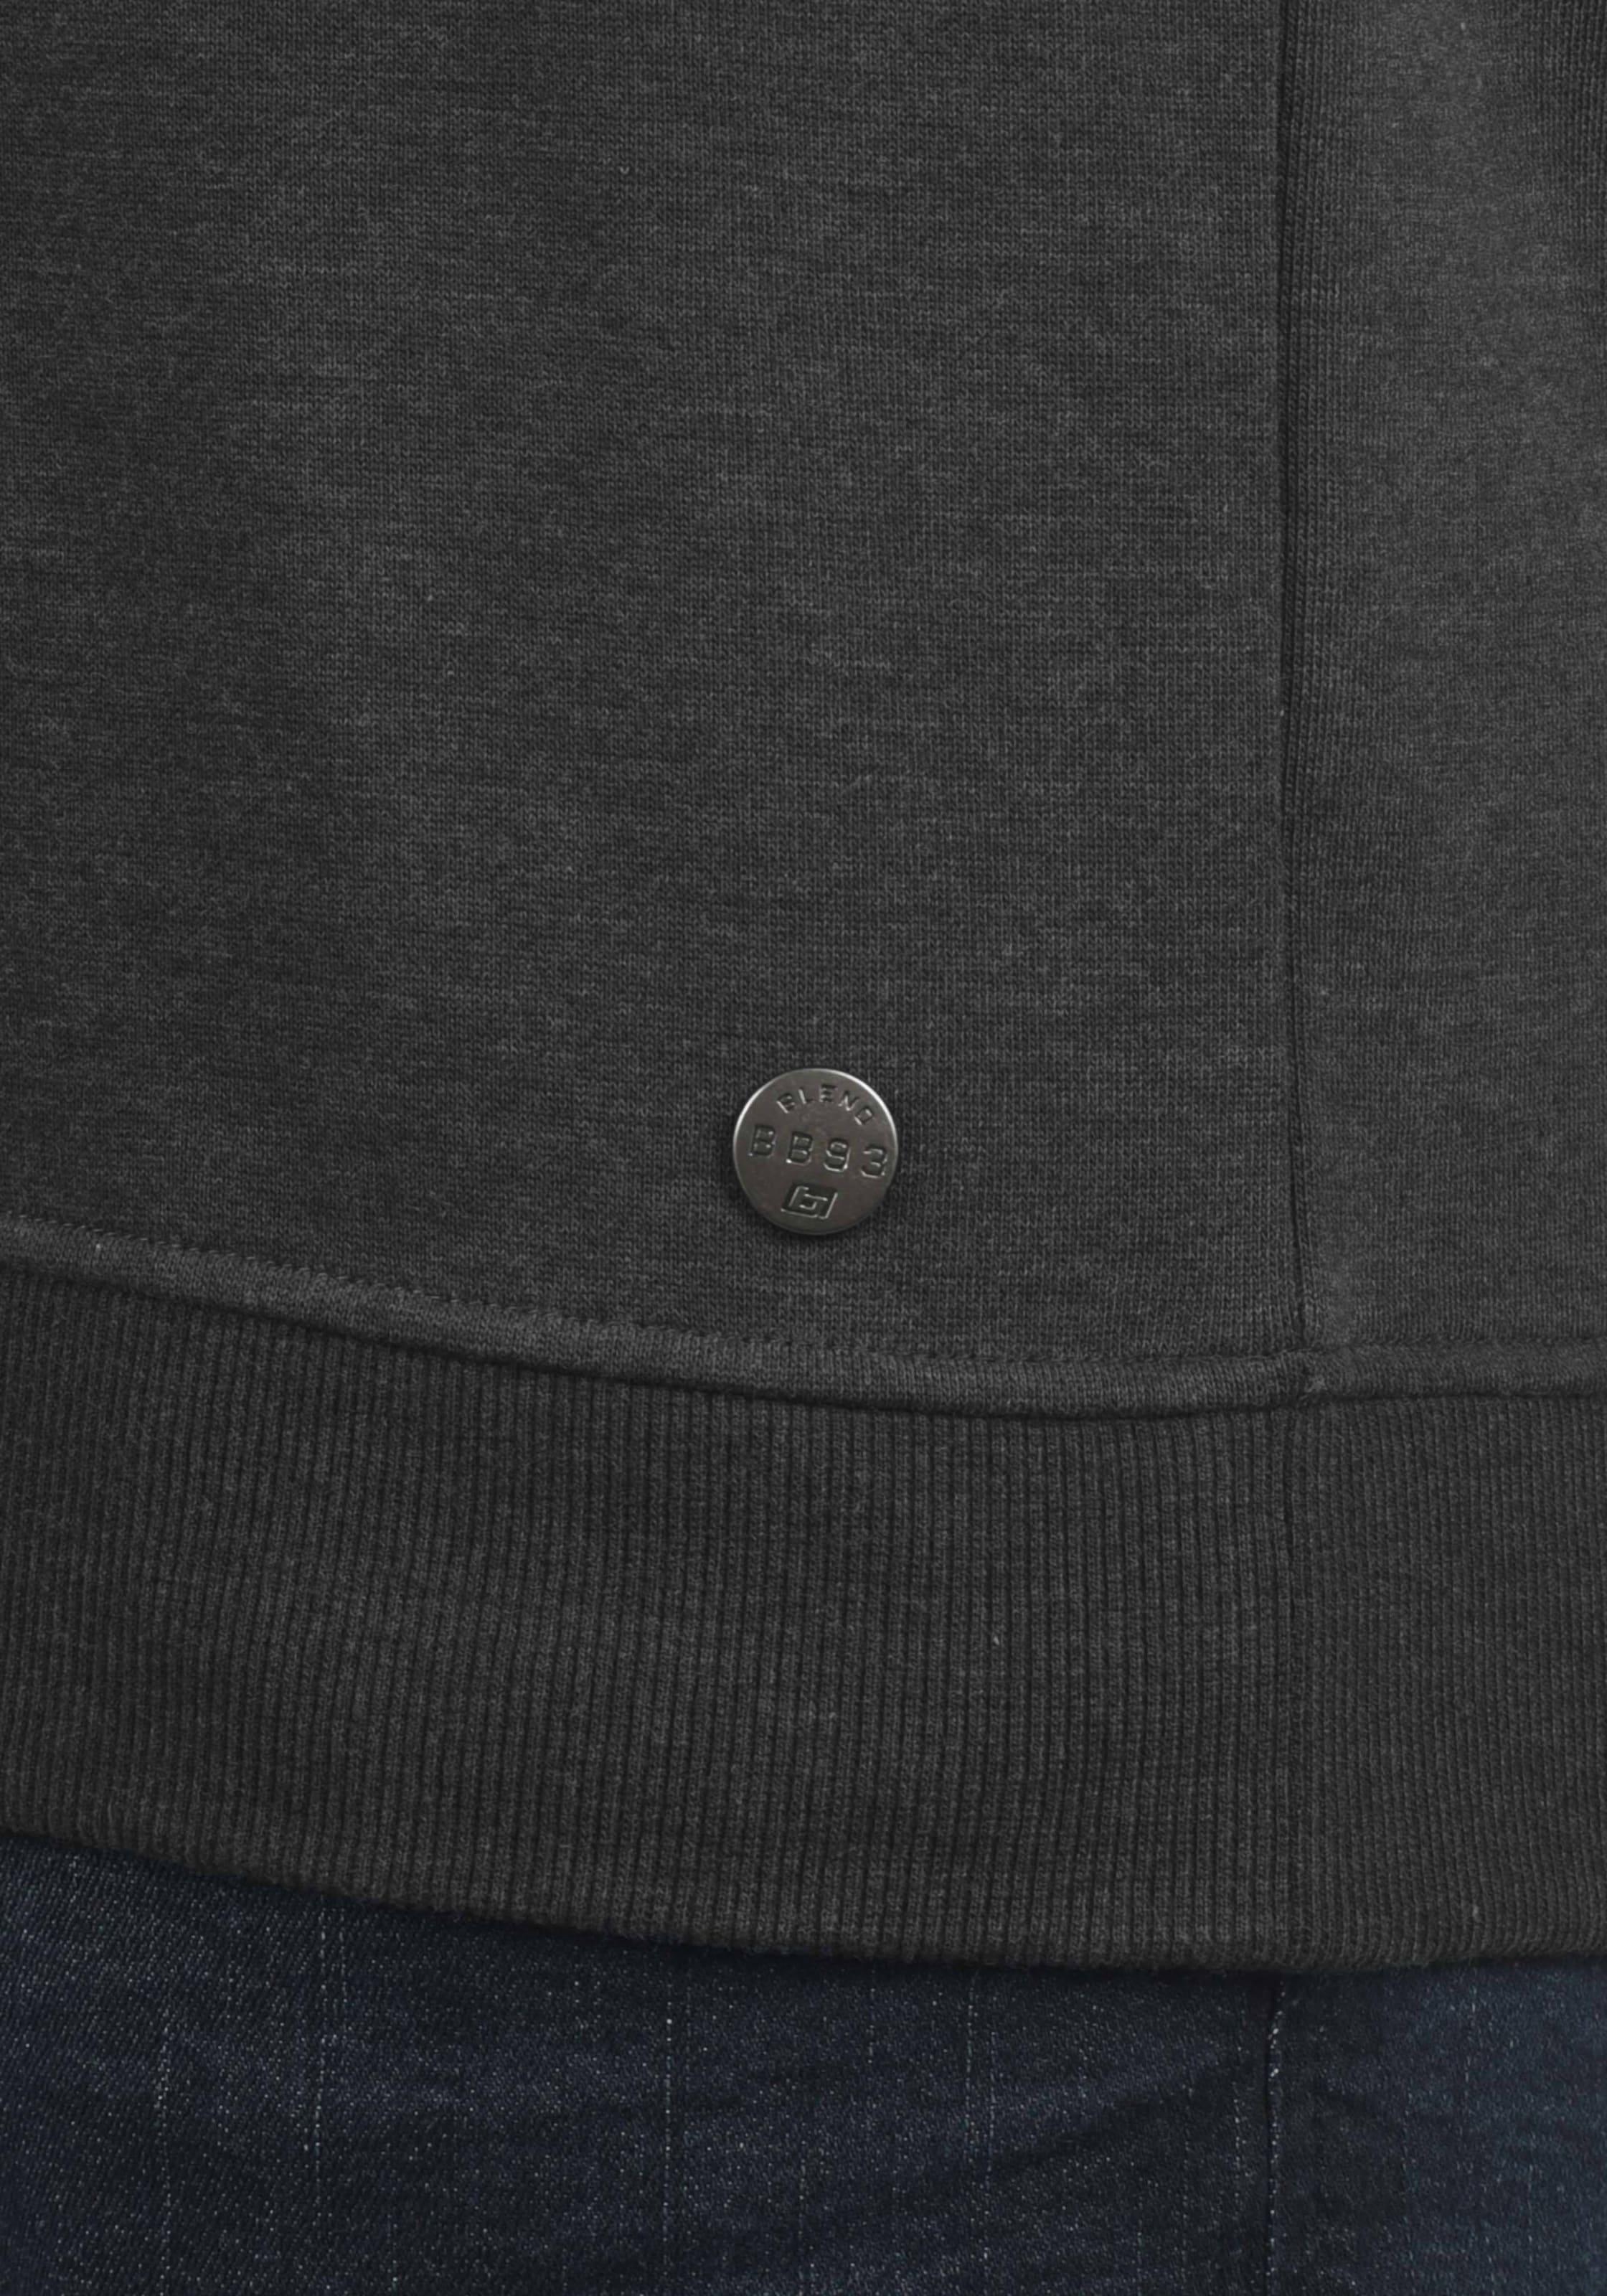 Blend Blend In Sweatshirt Grau Blend Sweatshirt 'jesper' Grau Sweatshirt In In 'jesper' 'jesper' nkN80wPZXO